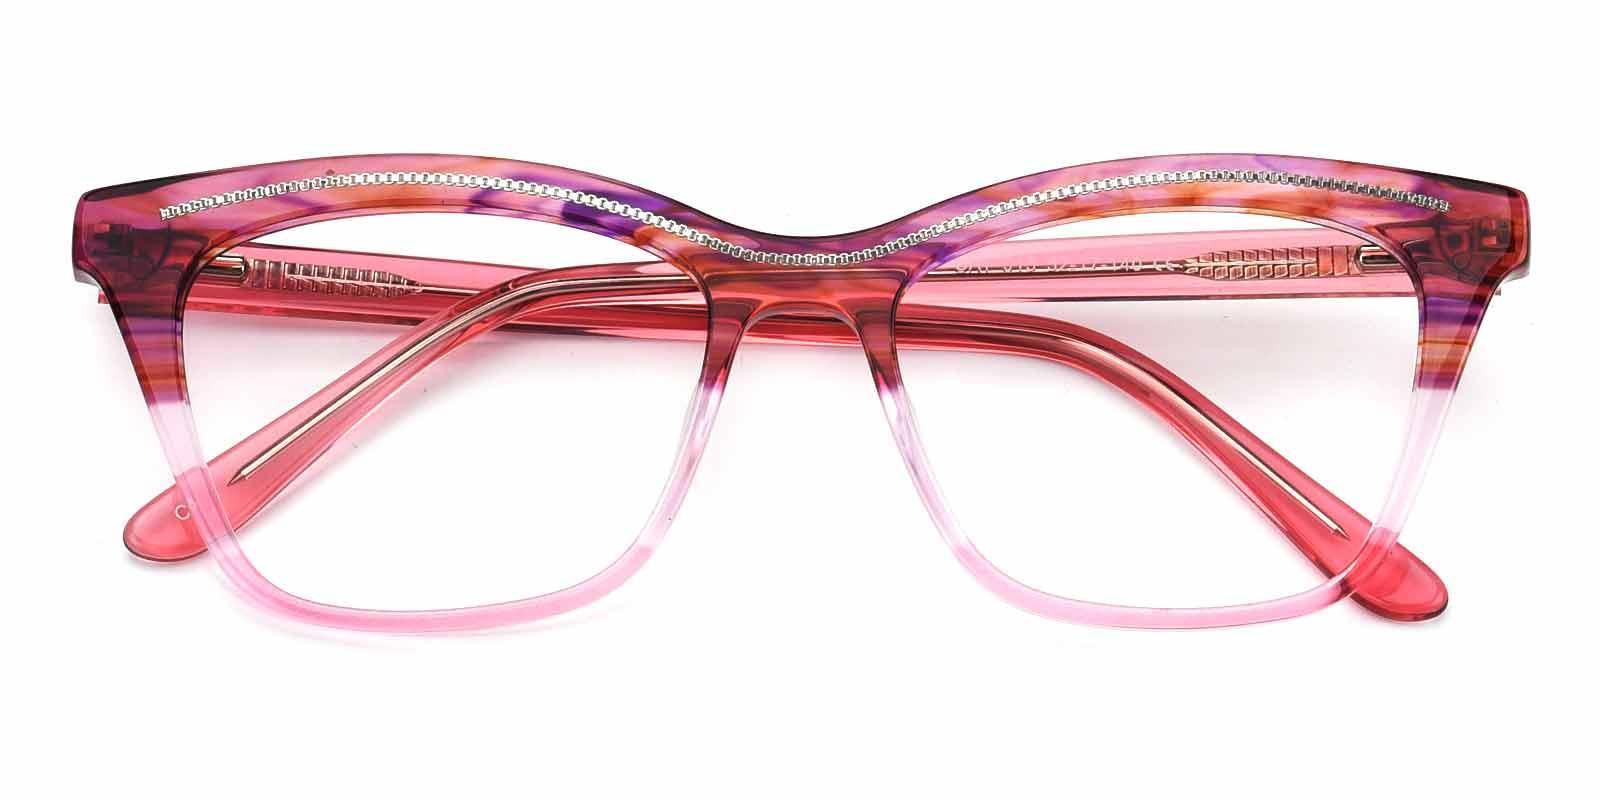 Tina-Red-Browline-Acetate-Eyeglasses-detail